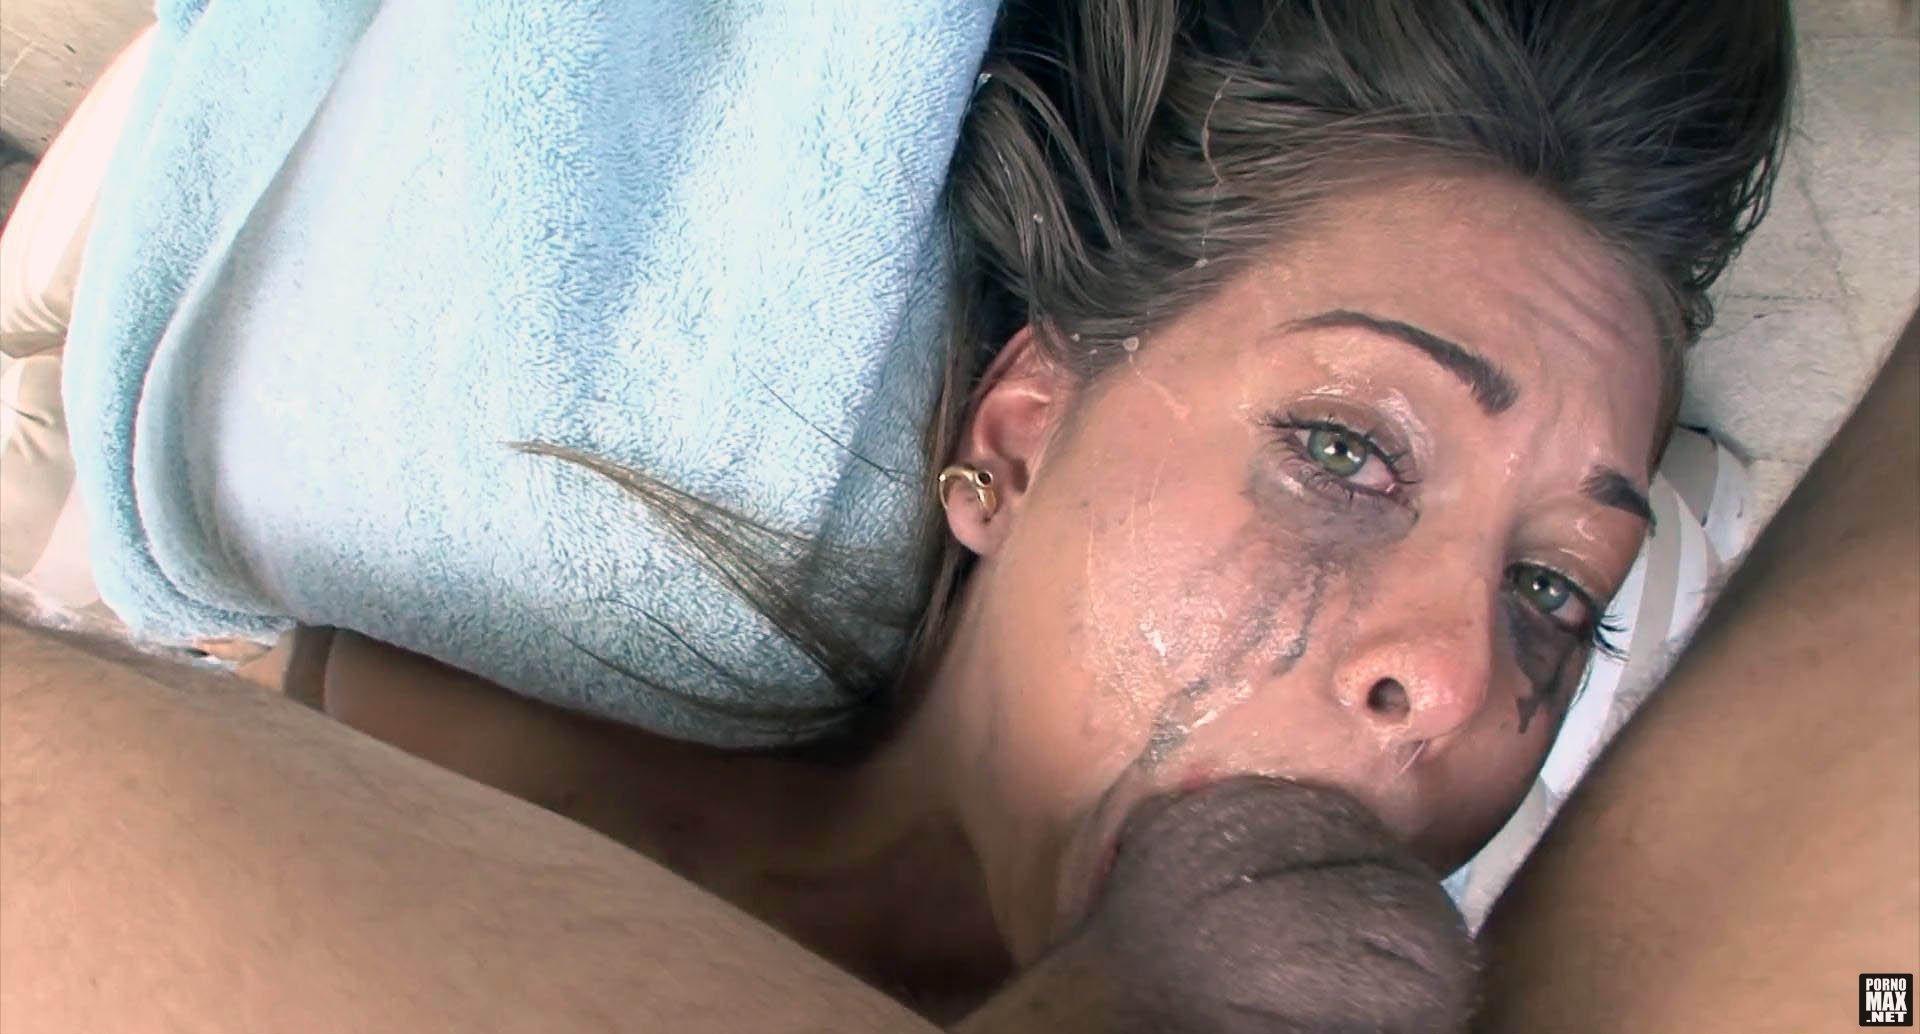 глубокий анус: порно видео онлайн, смотреть порно на Rus.Porn